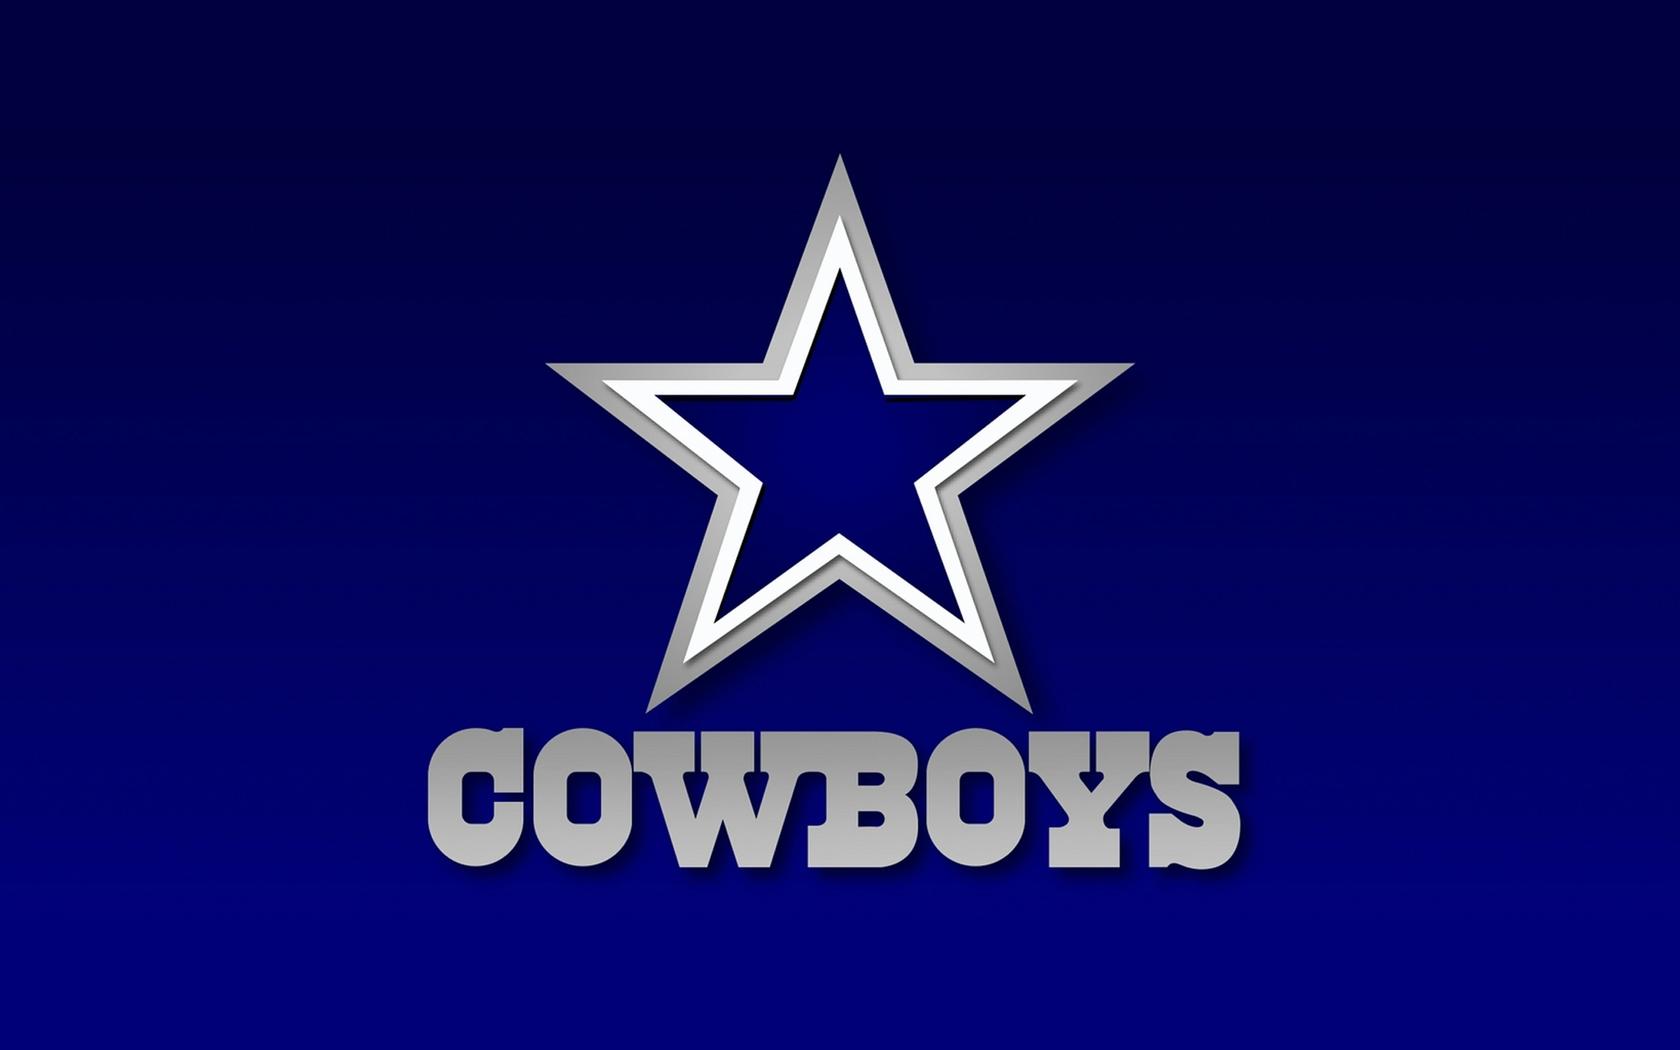 49] Dallas Cowboys Wallpapers on WallpaperSafari 1680x1050